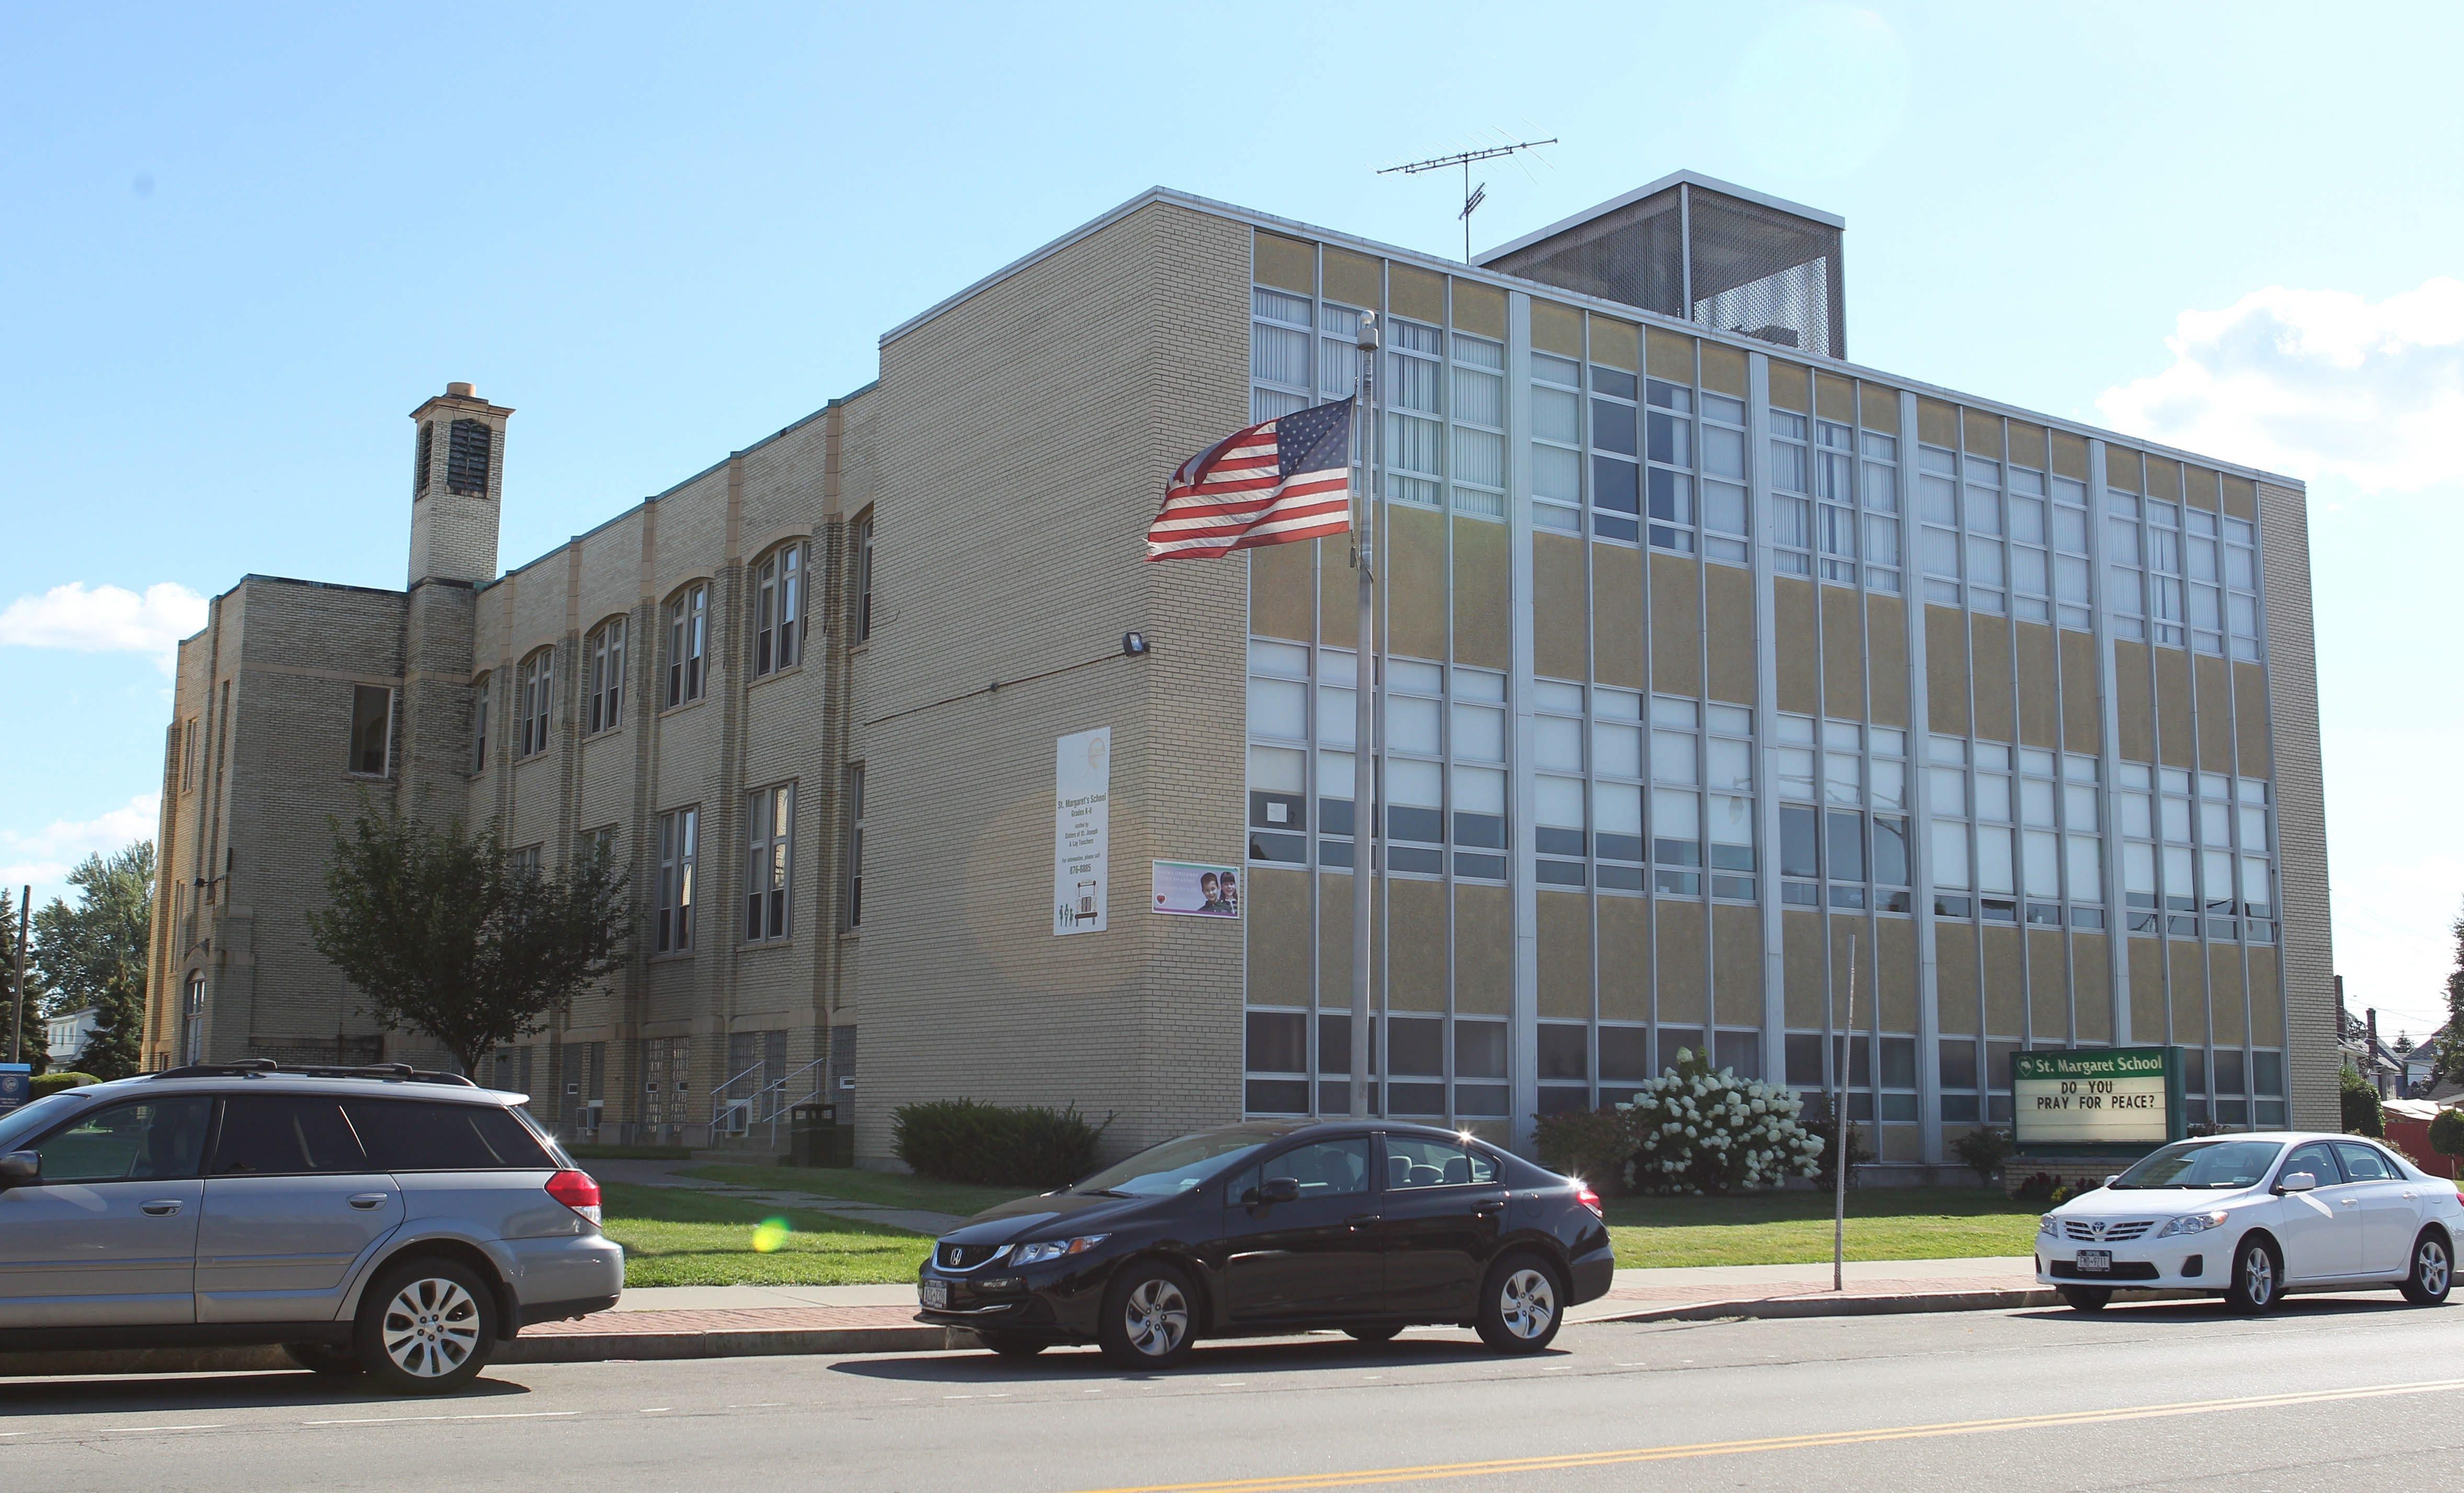 St. Margaret's School, 2015. Buffalo News photo